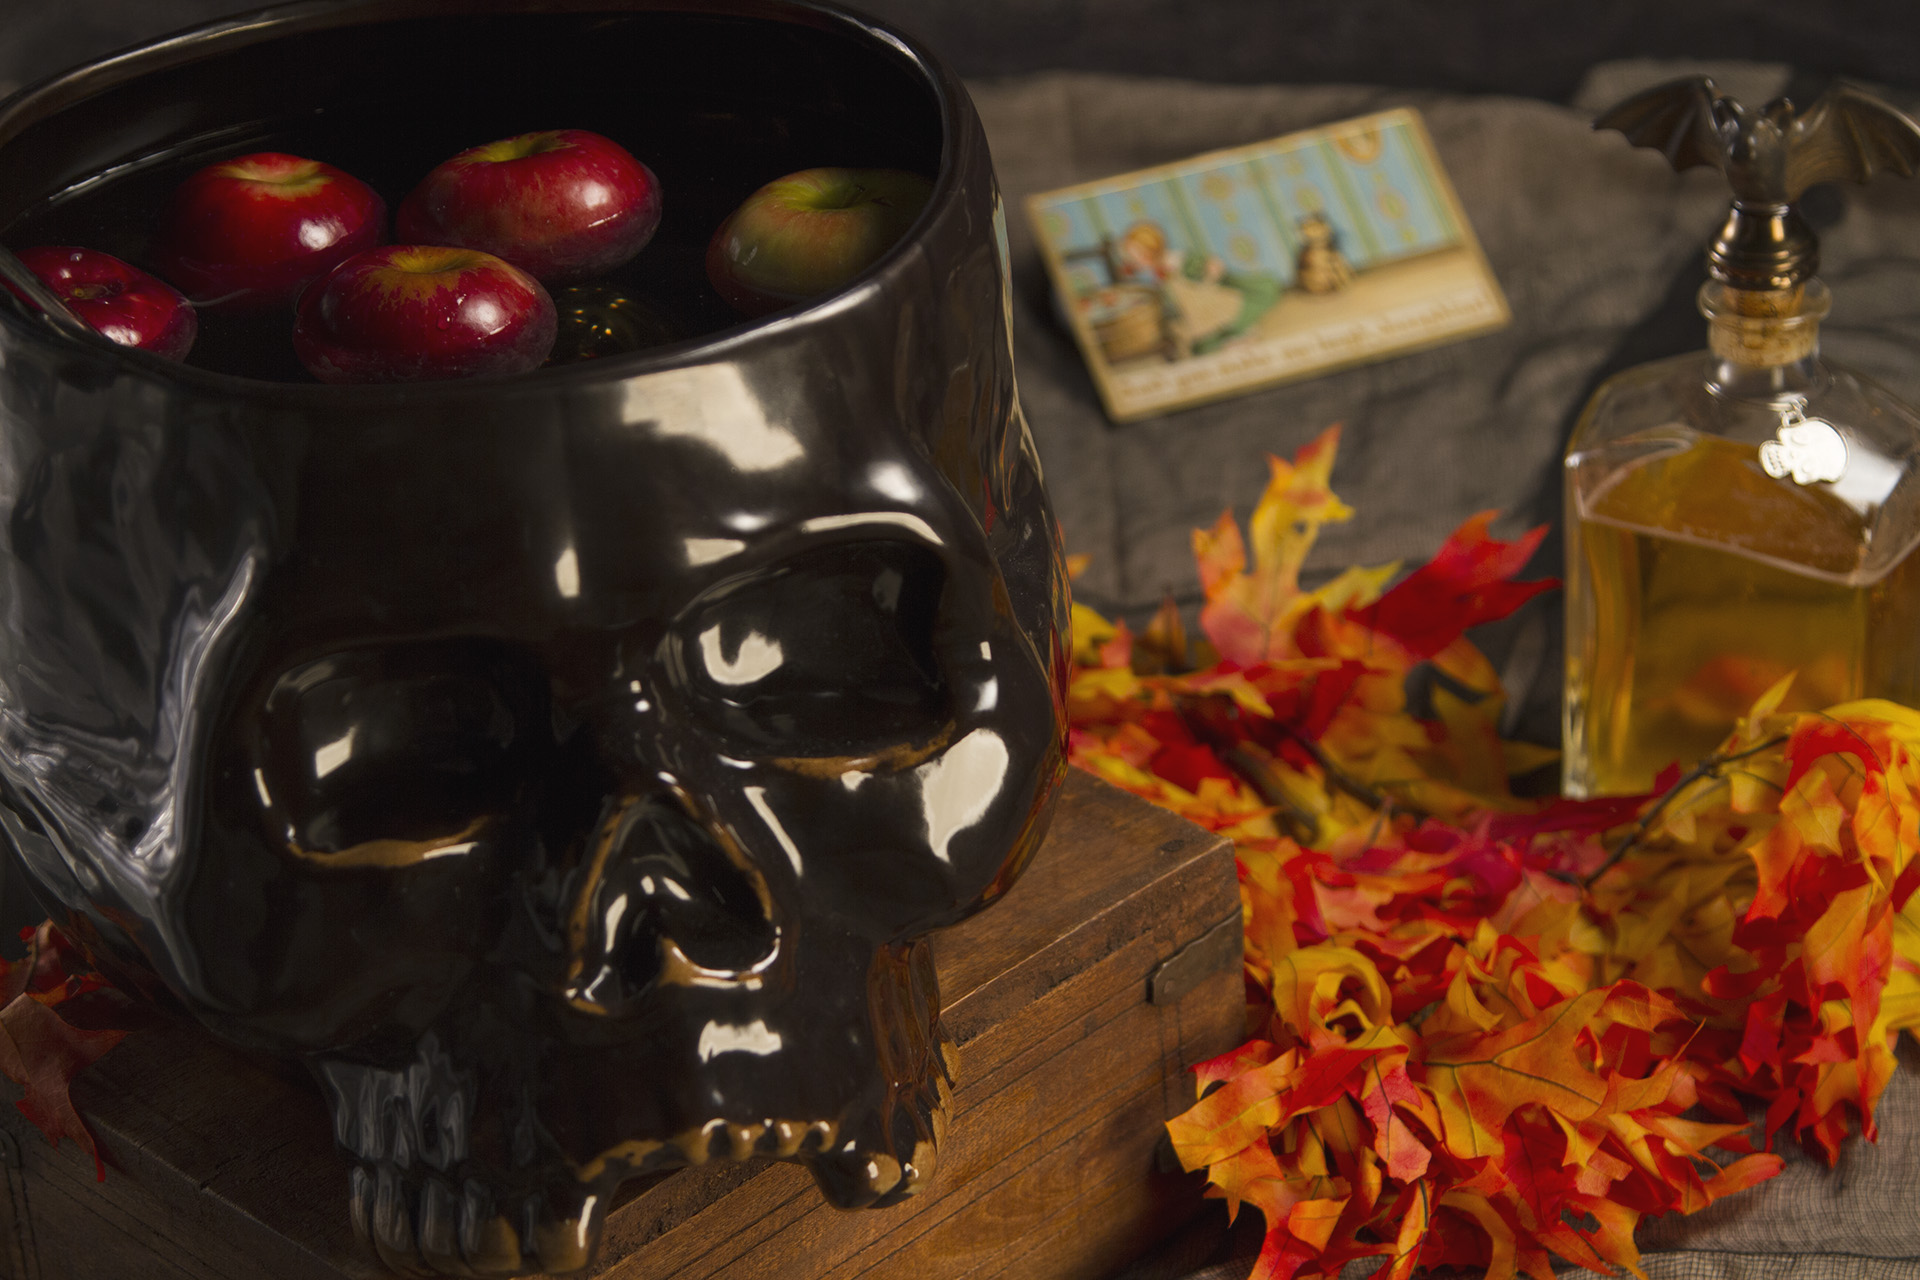 Bourbon for Apples Punch